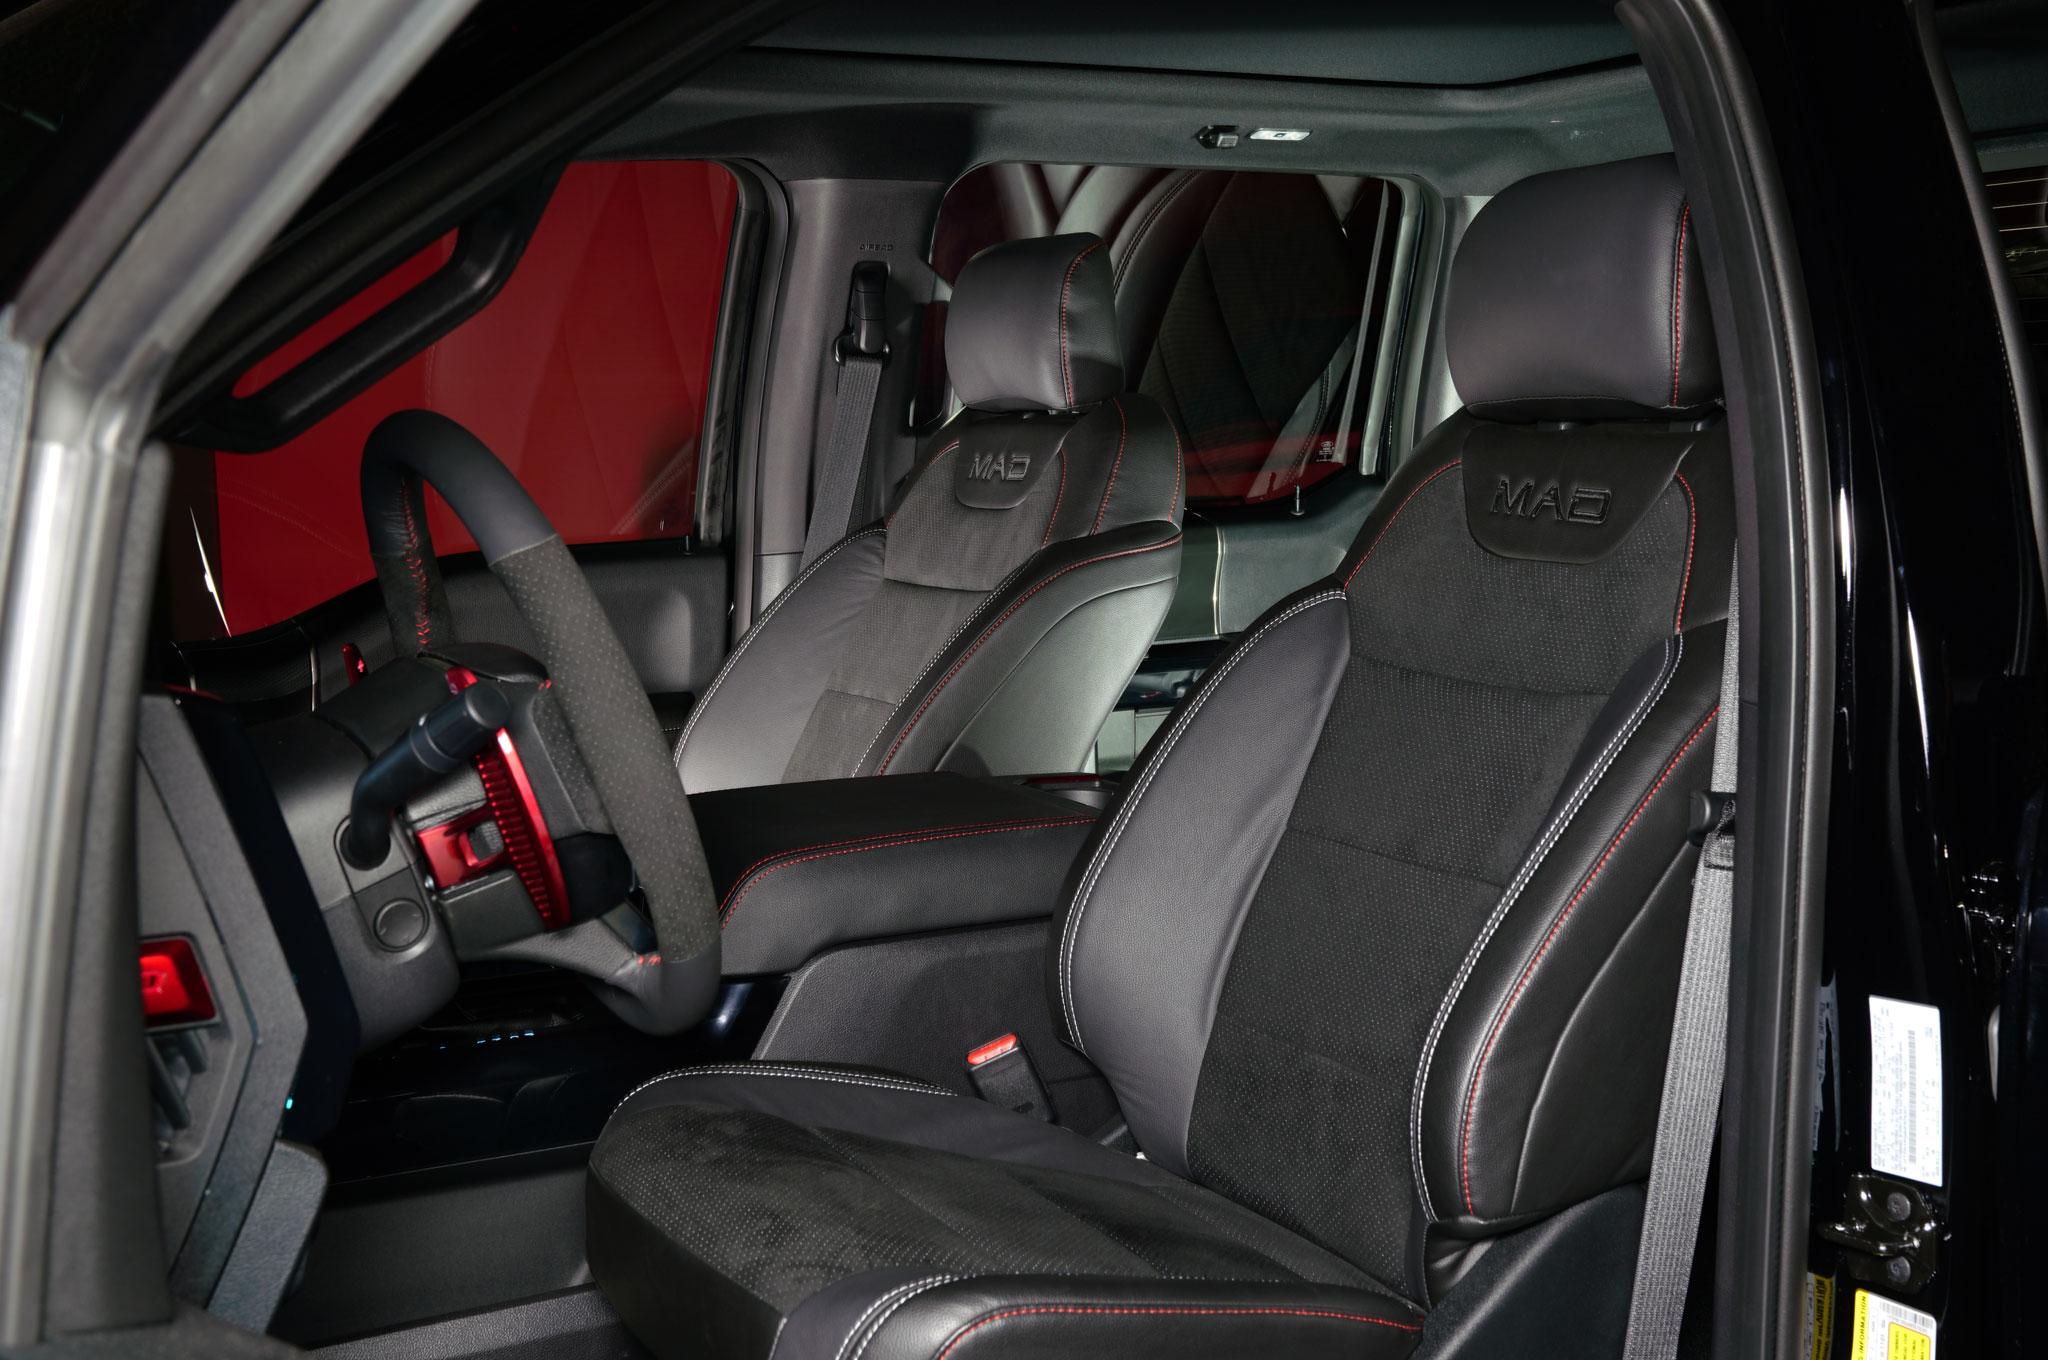 2018 Ford F 150 Raptor MAD Industries Black Drivers Interior 02